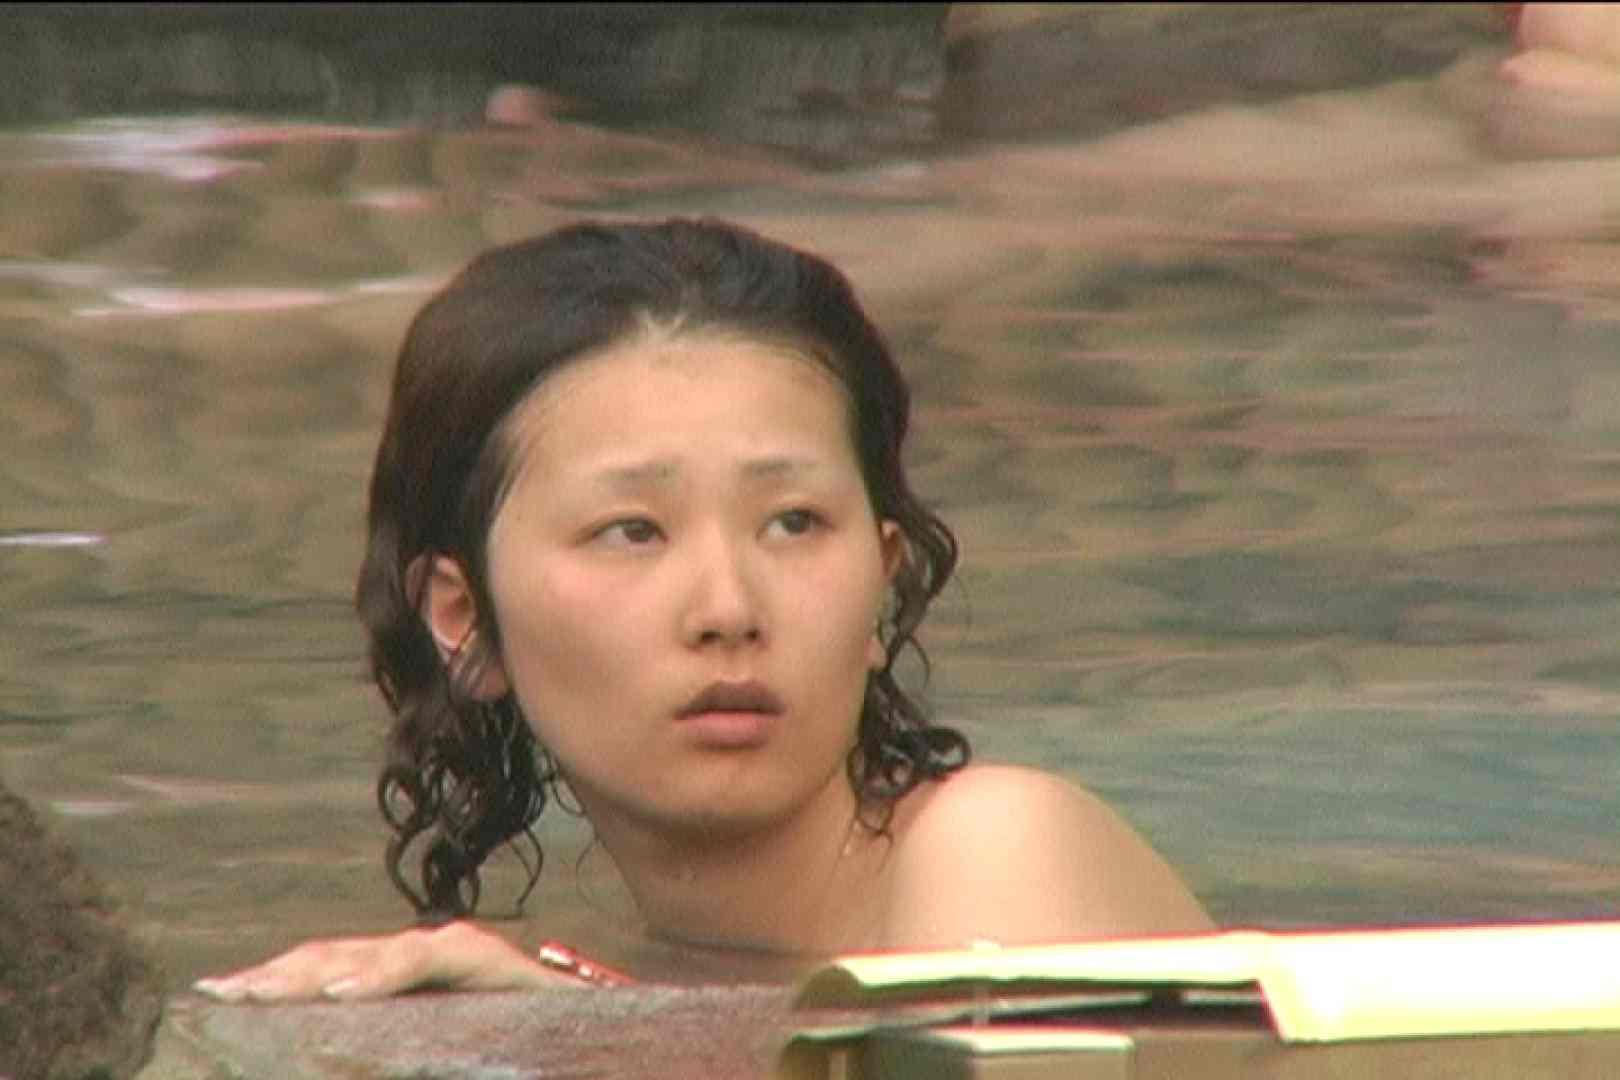 Aquaな露天風呂Vol.131 女体盗撮 覗きスケベ動画紹介 82連発 32